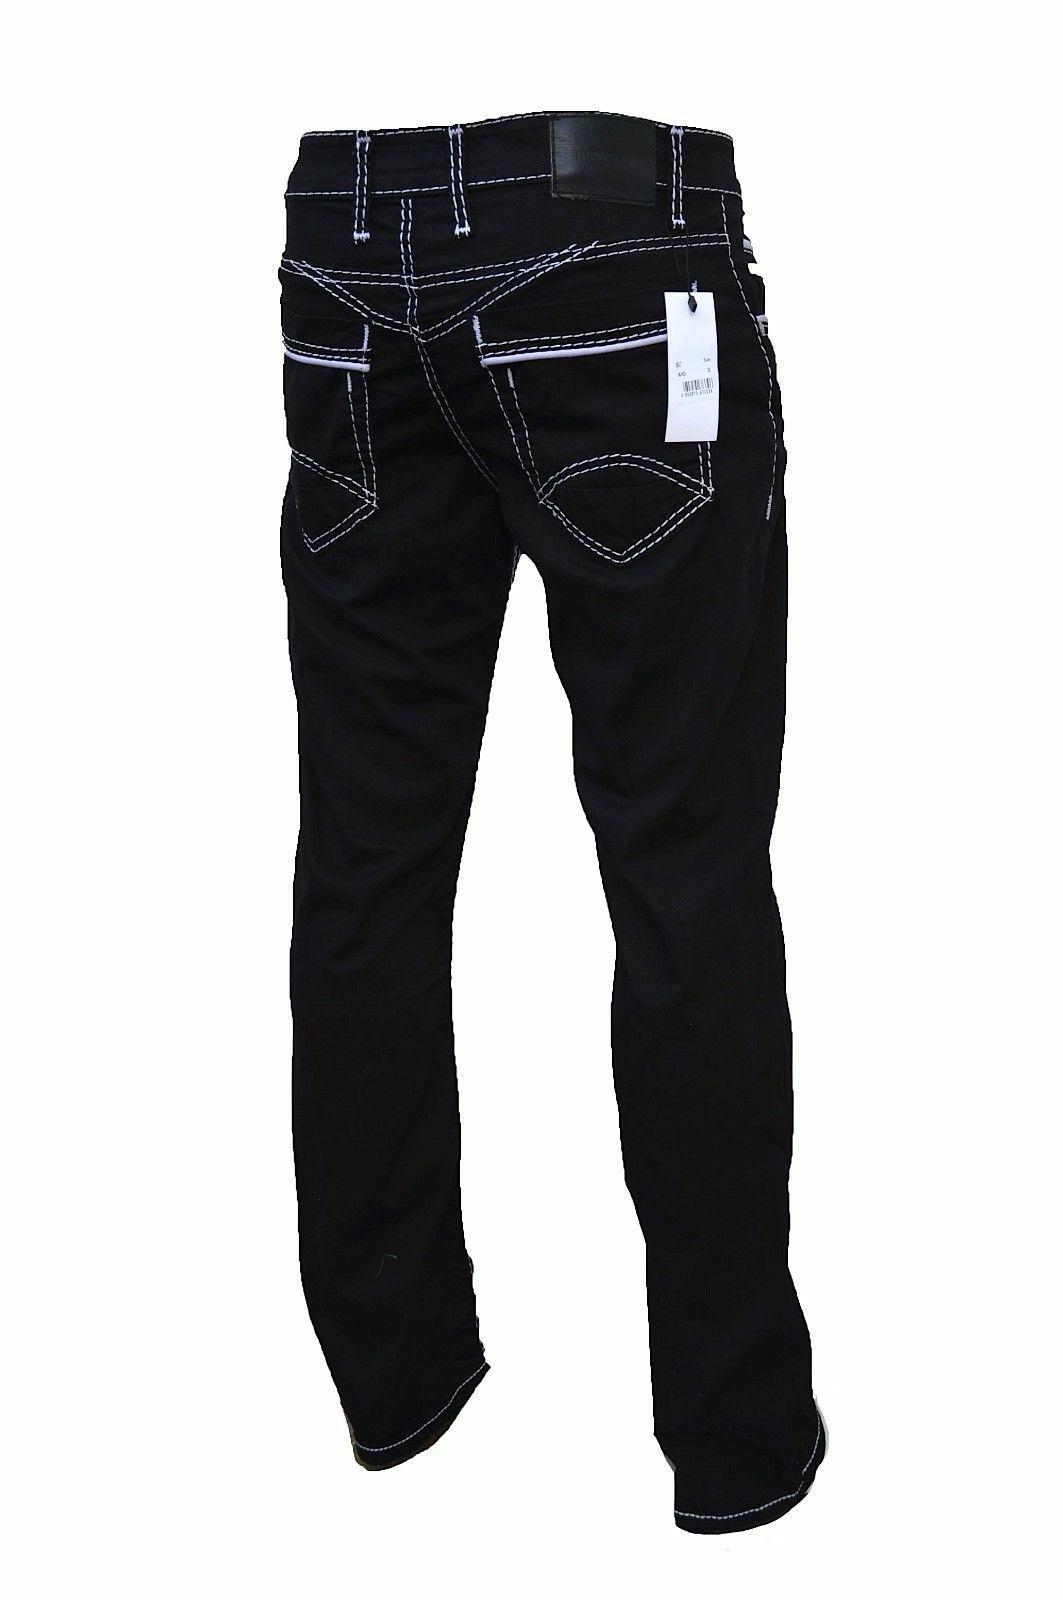 Herren-Jeans-Hose-Denim-KC-Black-Washed-Straight-Cut-Regular-Dicke-Naht-naehte Indexbild 14